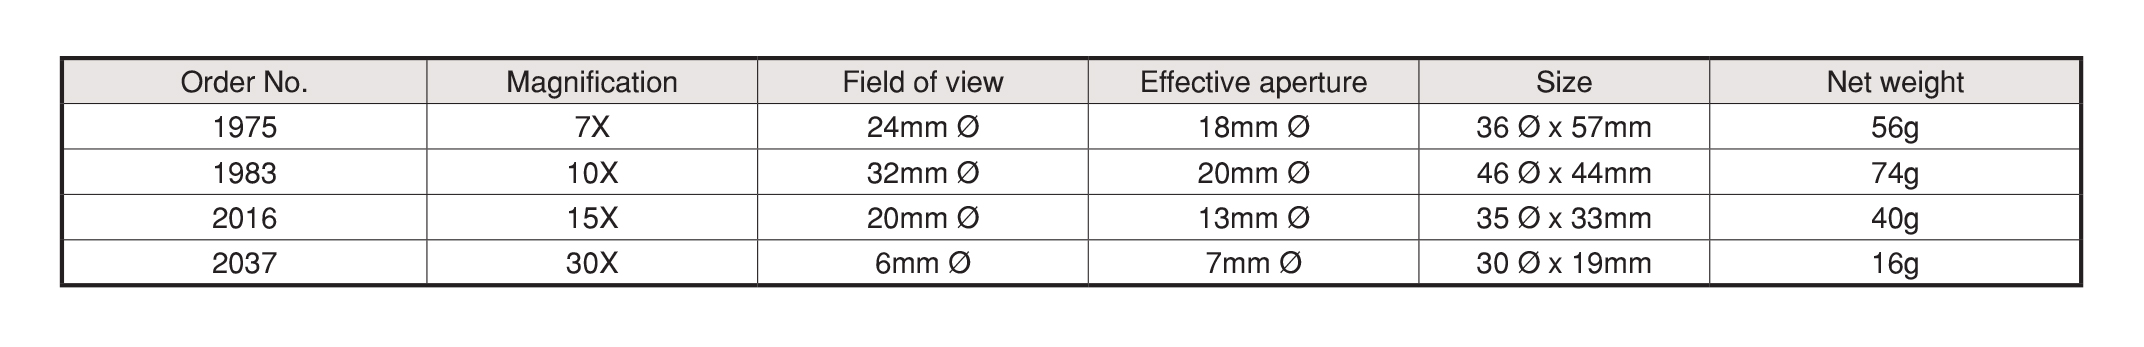 Scale Lupe แว่นขยายแบบมีสแกล PEAK table